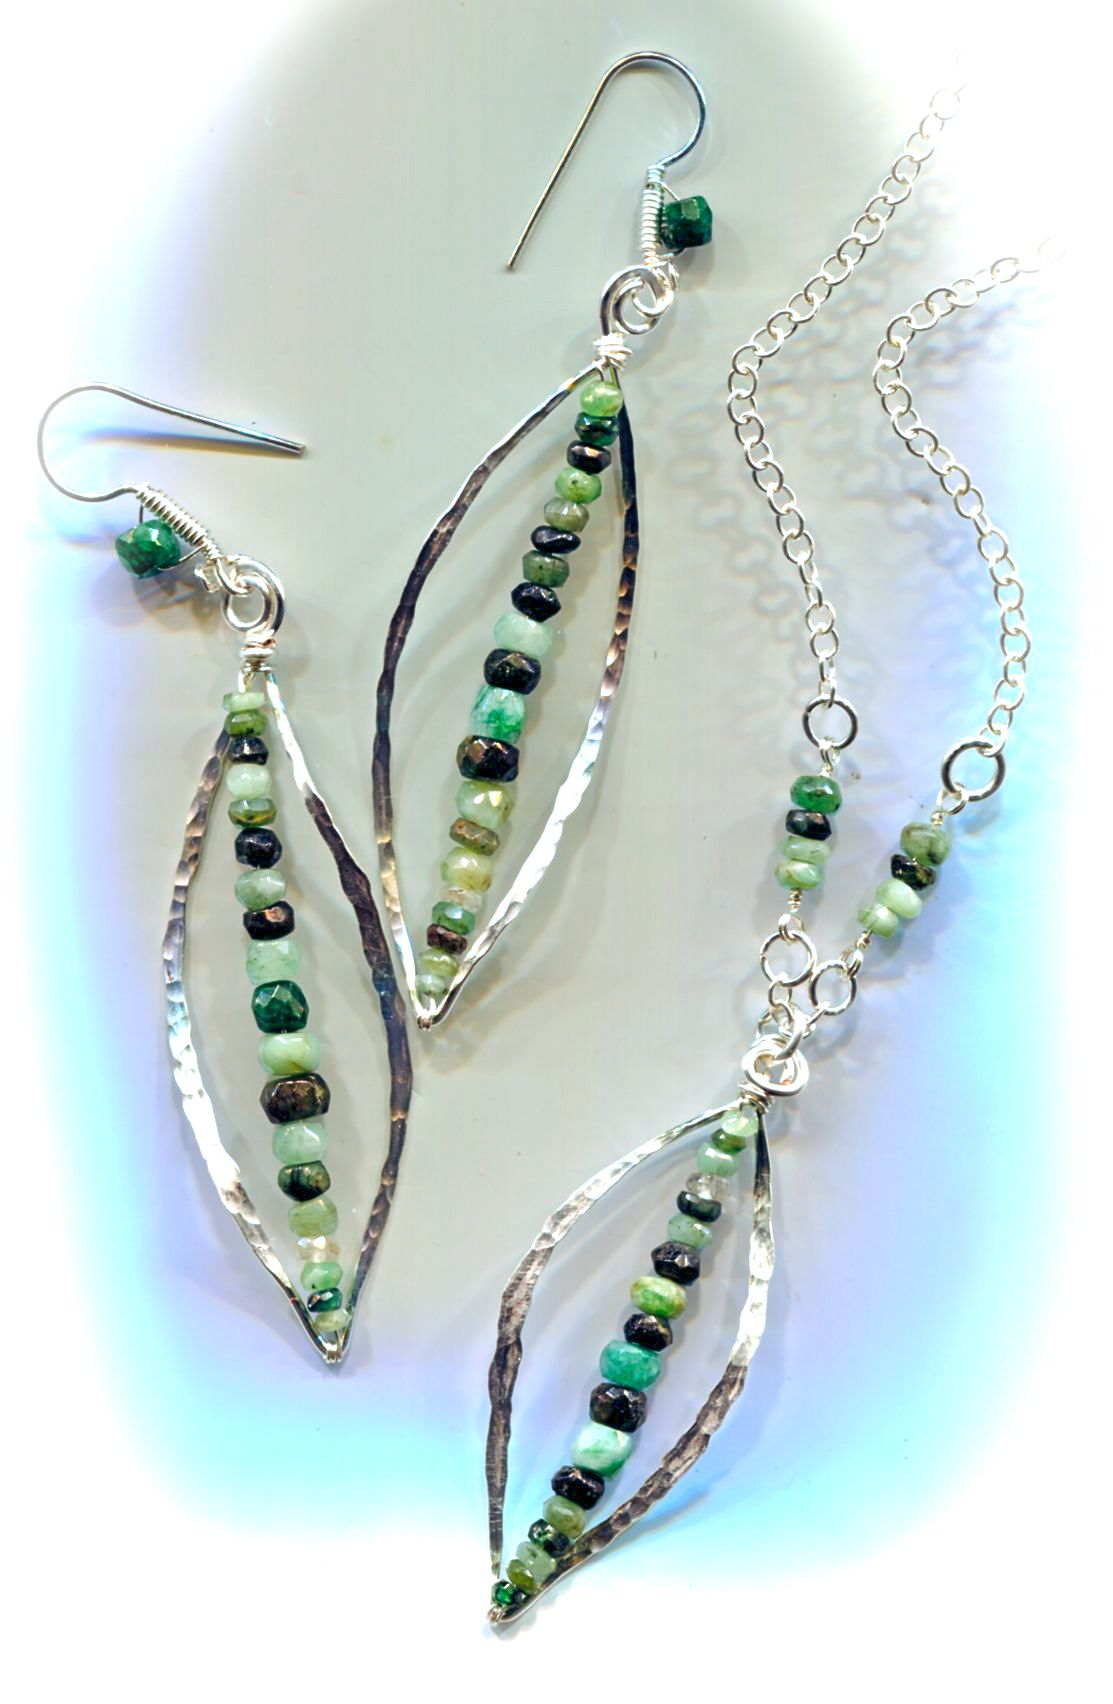 Whammered Leaf jewellery by Linda Jones